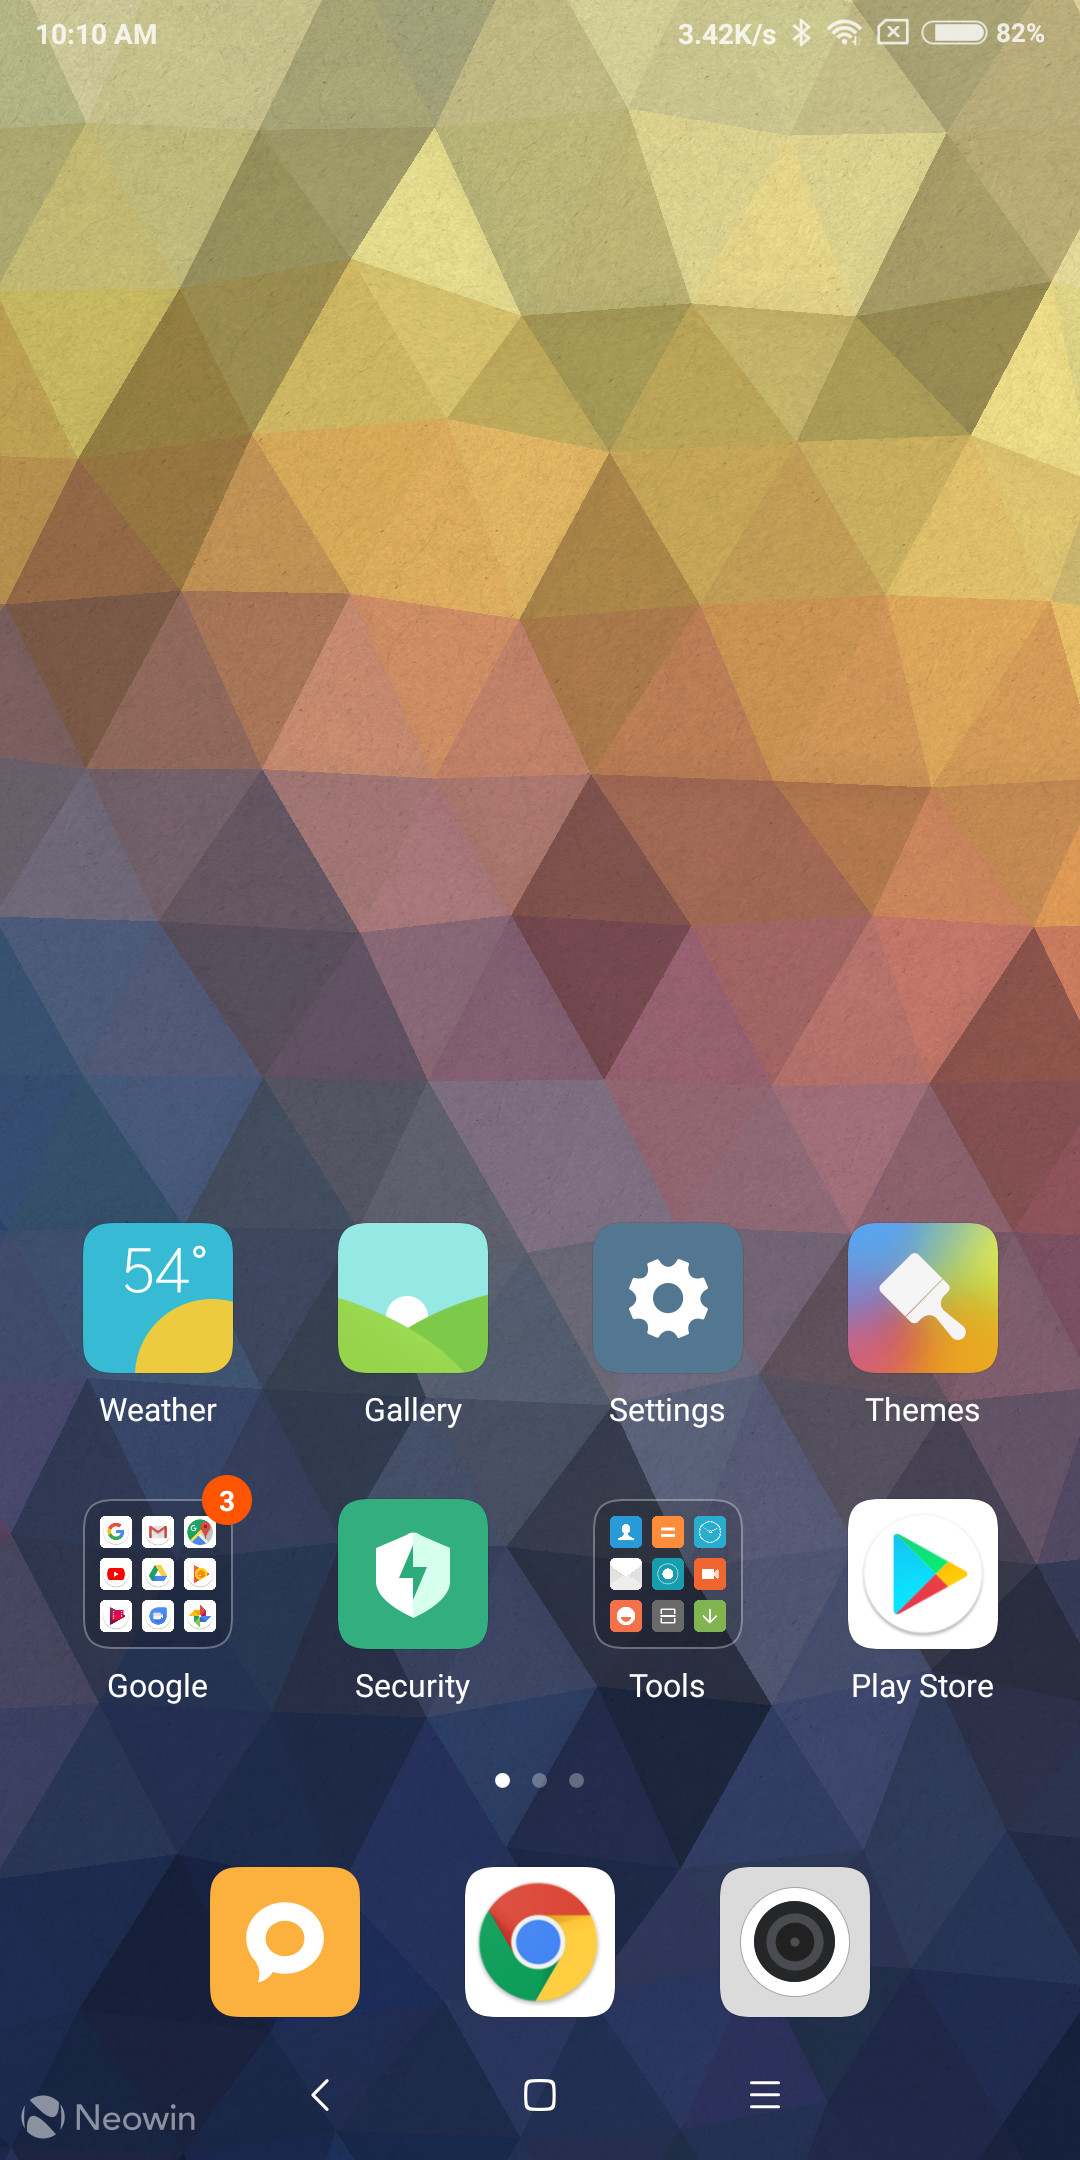 Xiaomi Mi MIX 2 review: A beautiful phone that you'll most